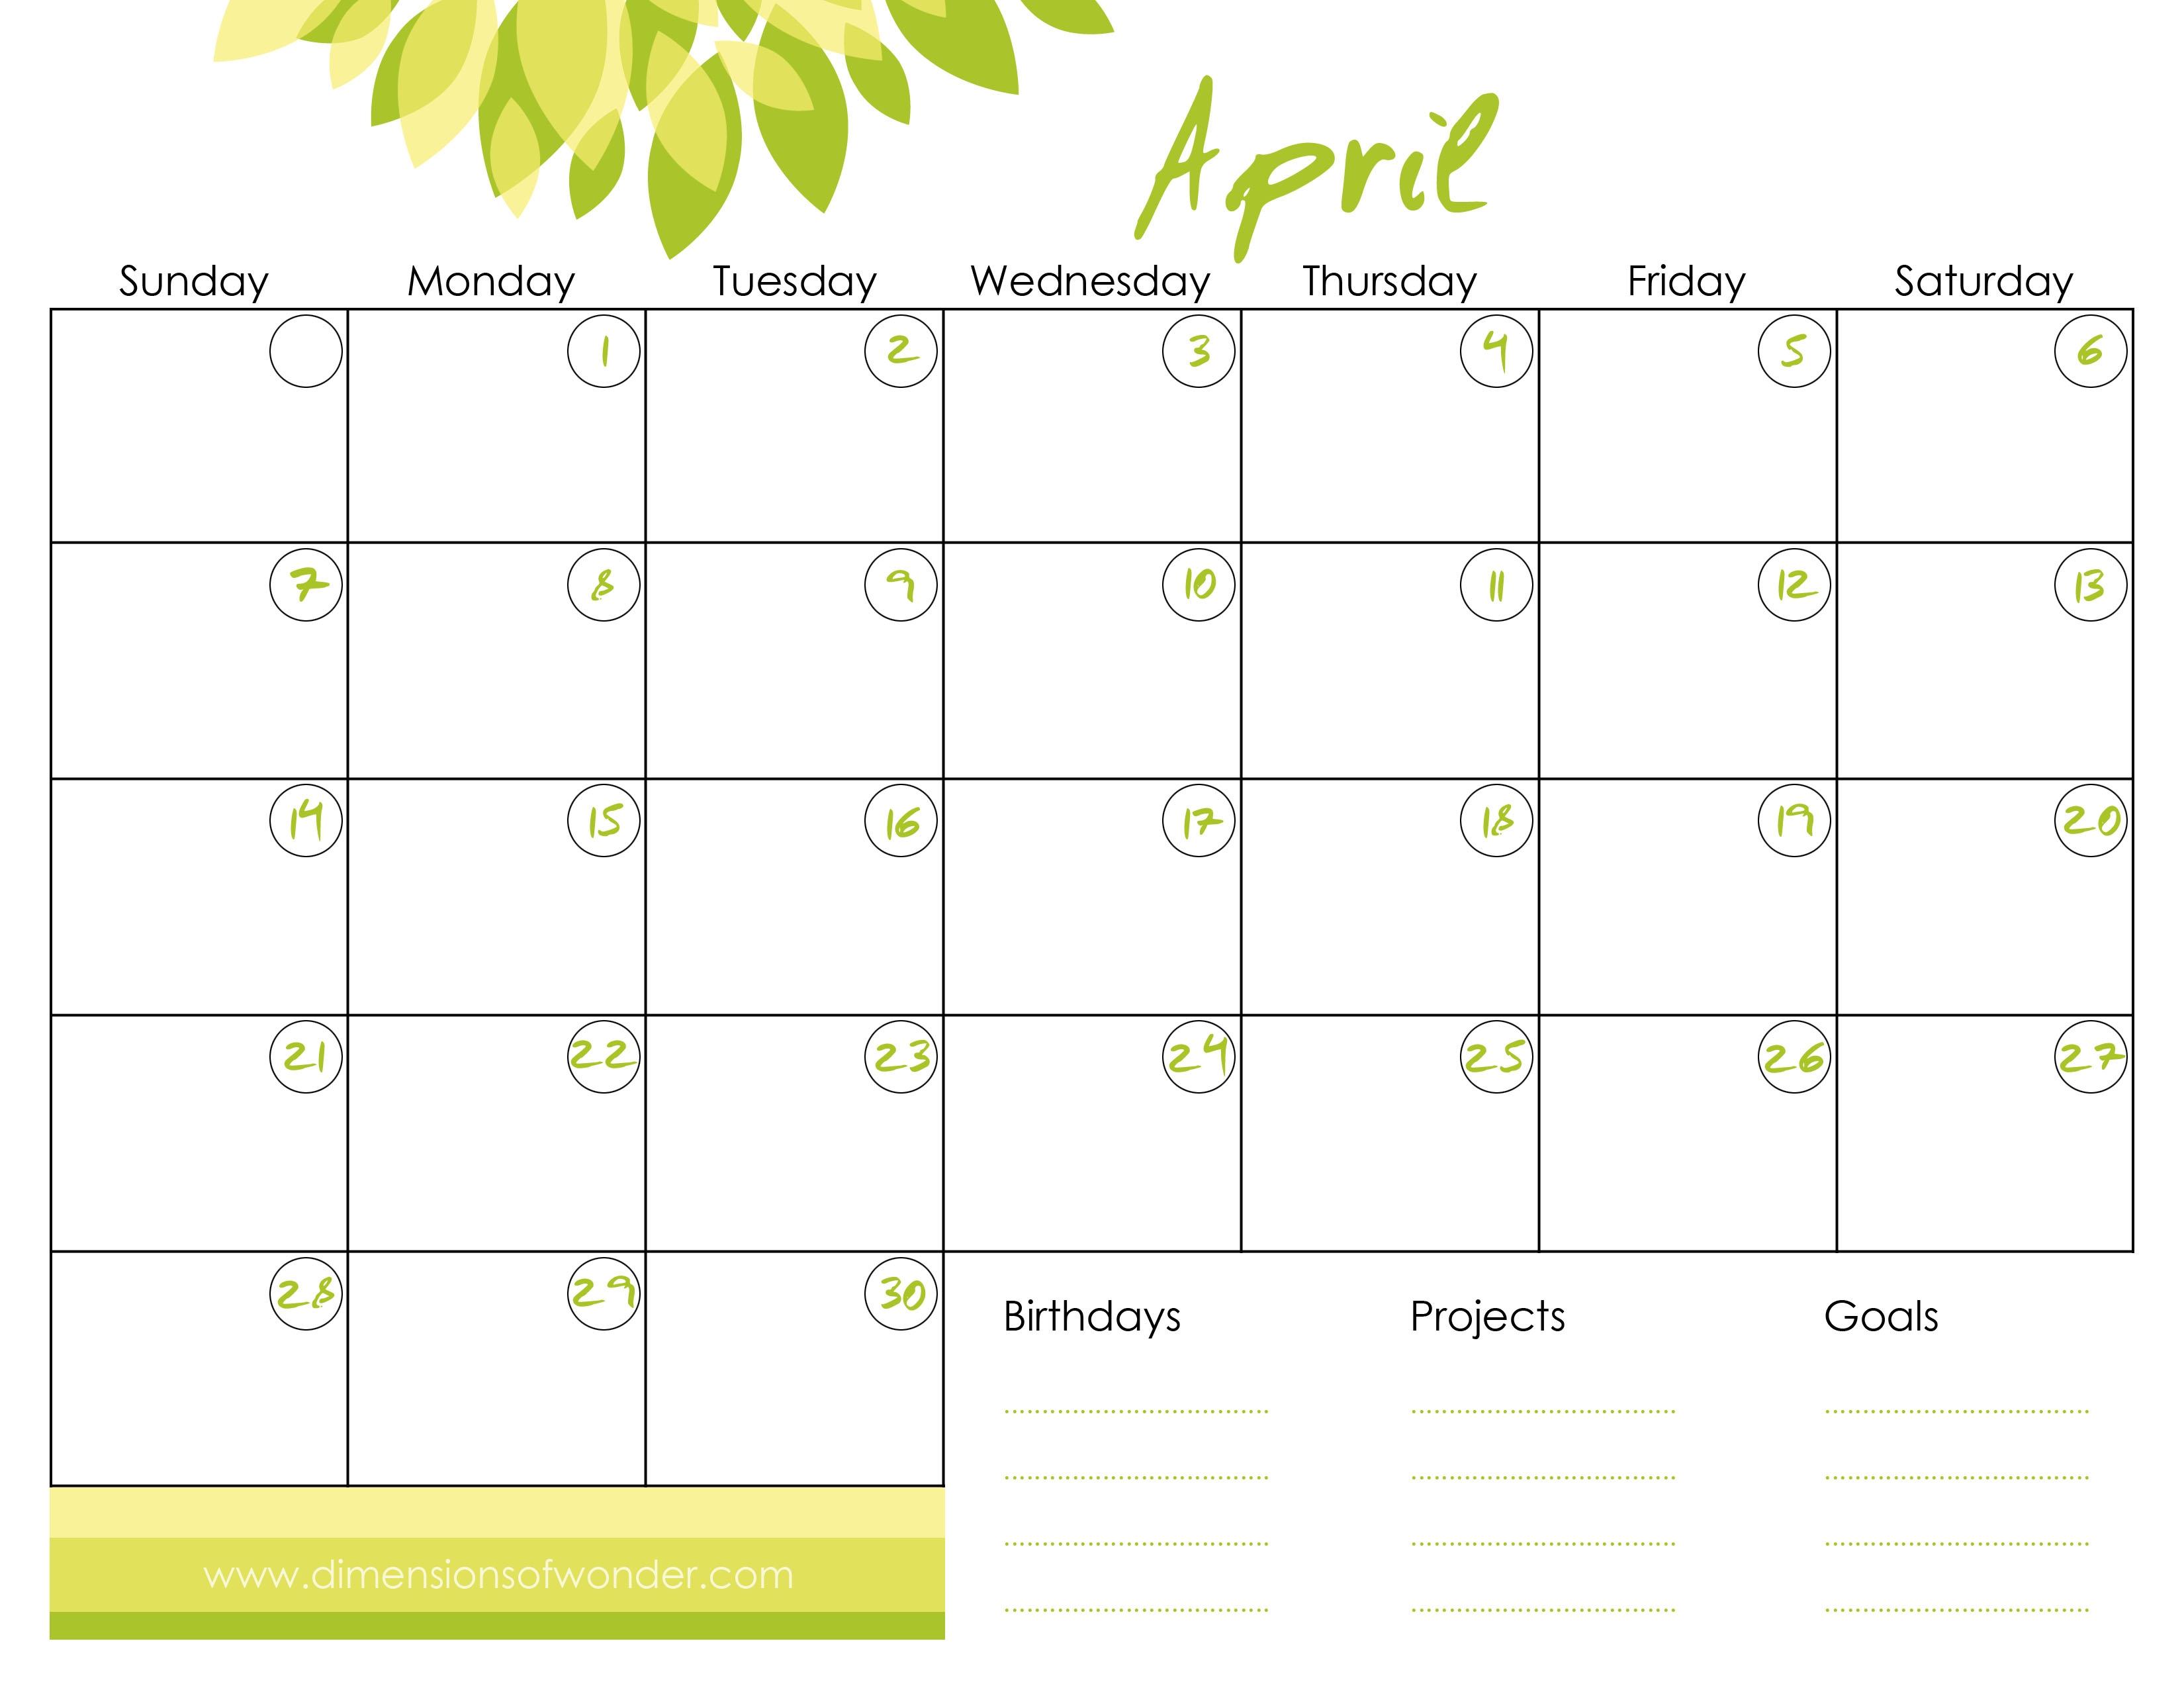 free printable online calendar meloin  Cute Free Monthly Printable Calendar 2018 erdferdf